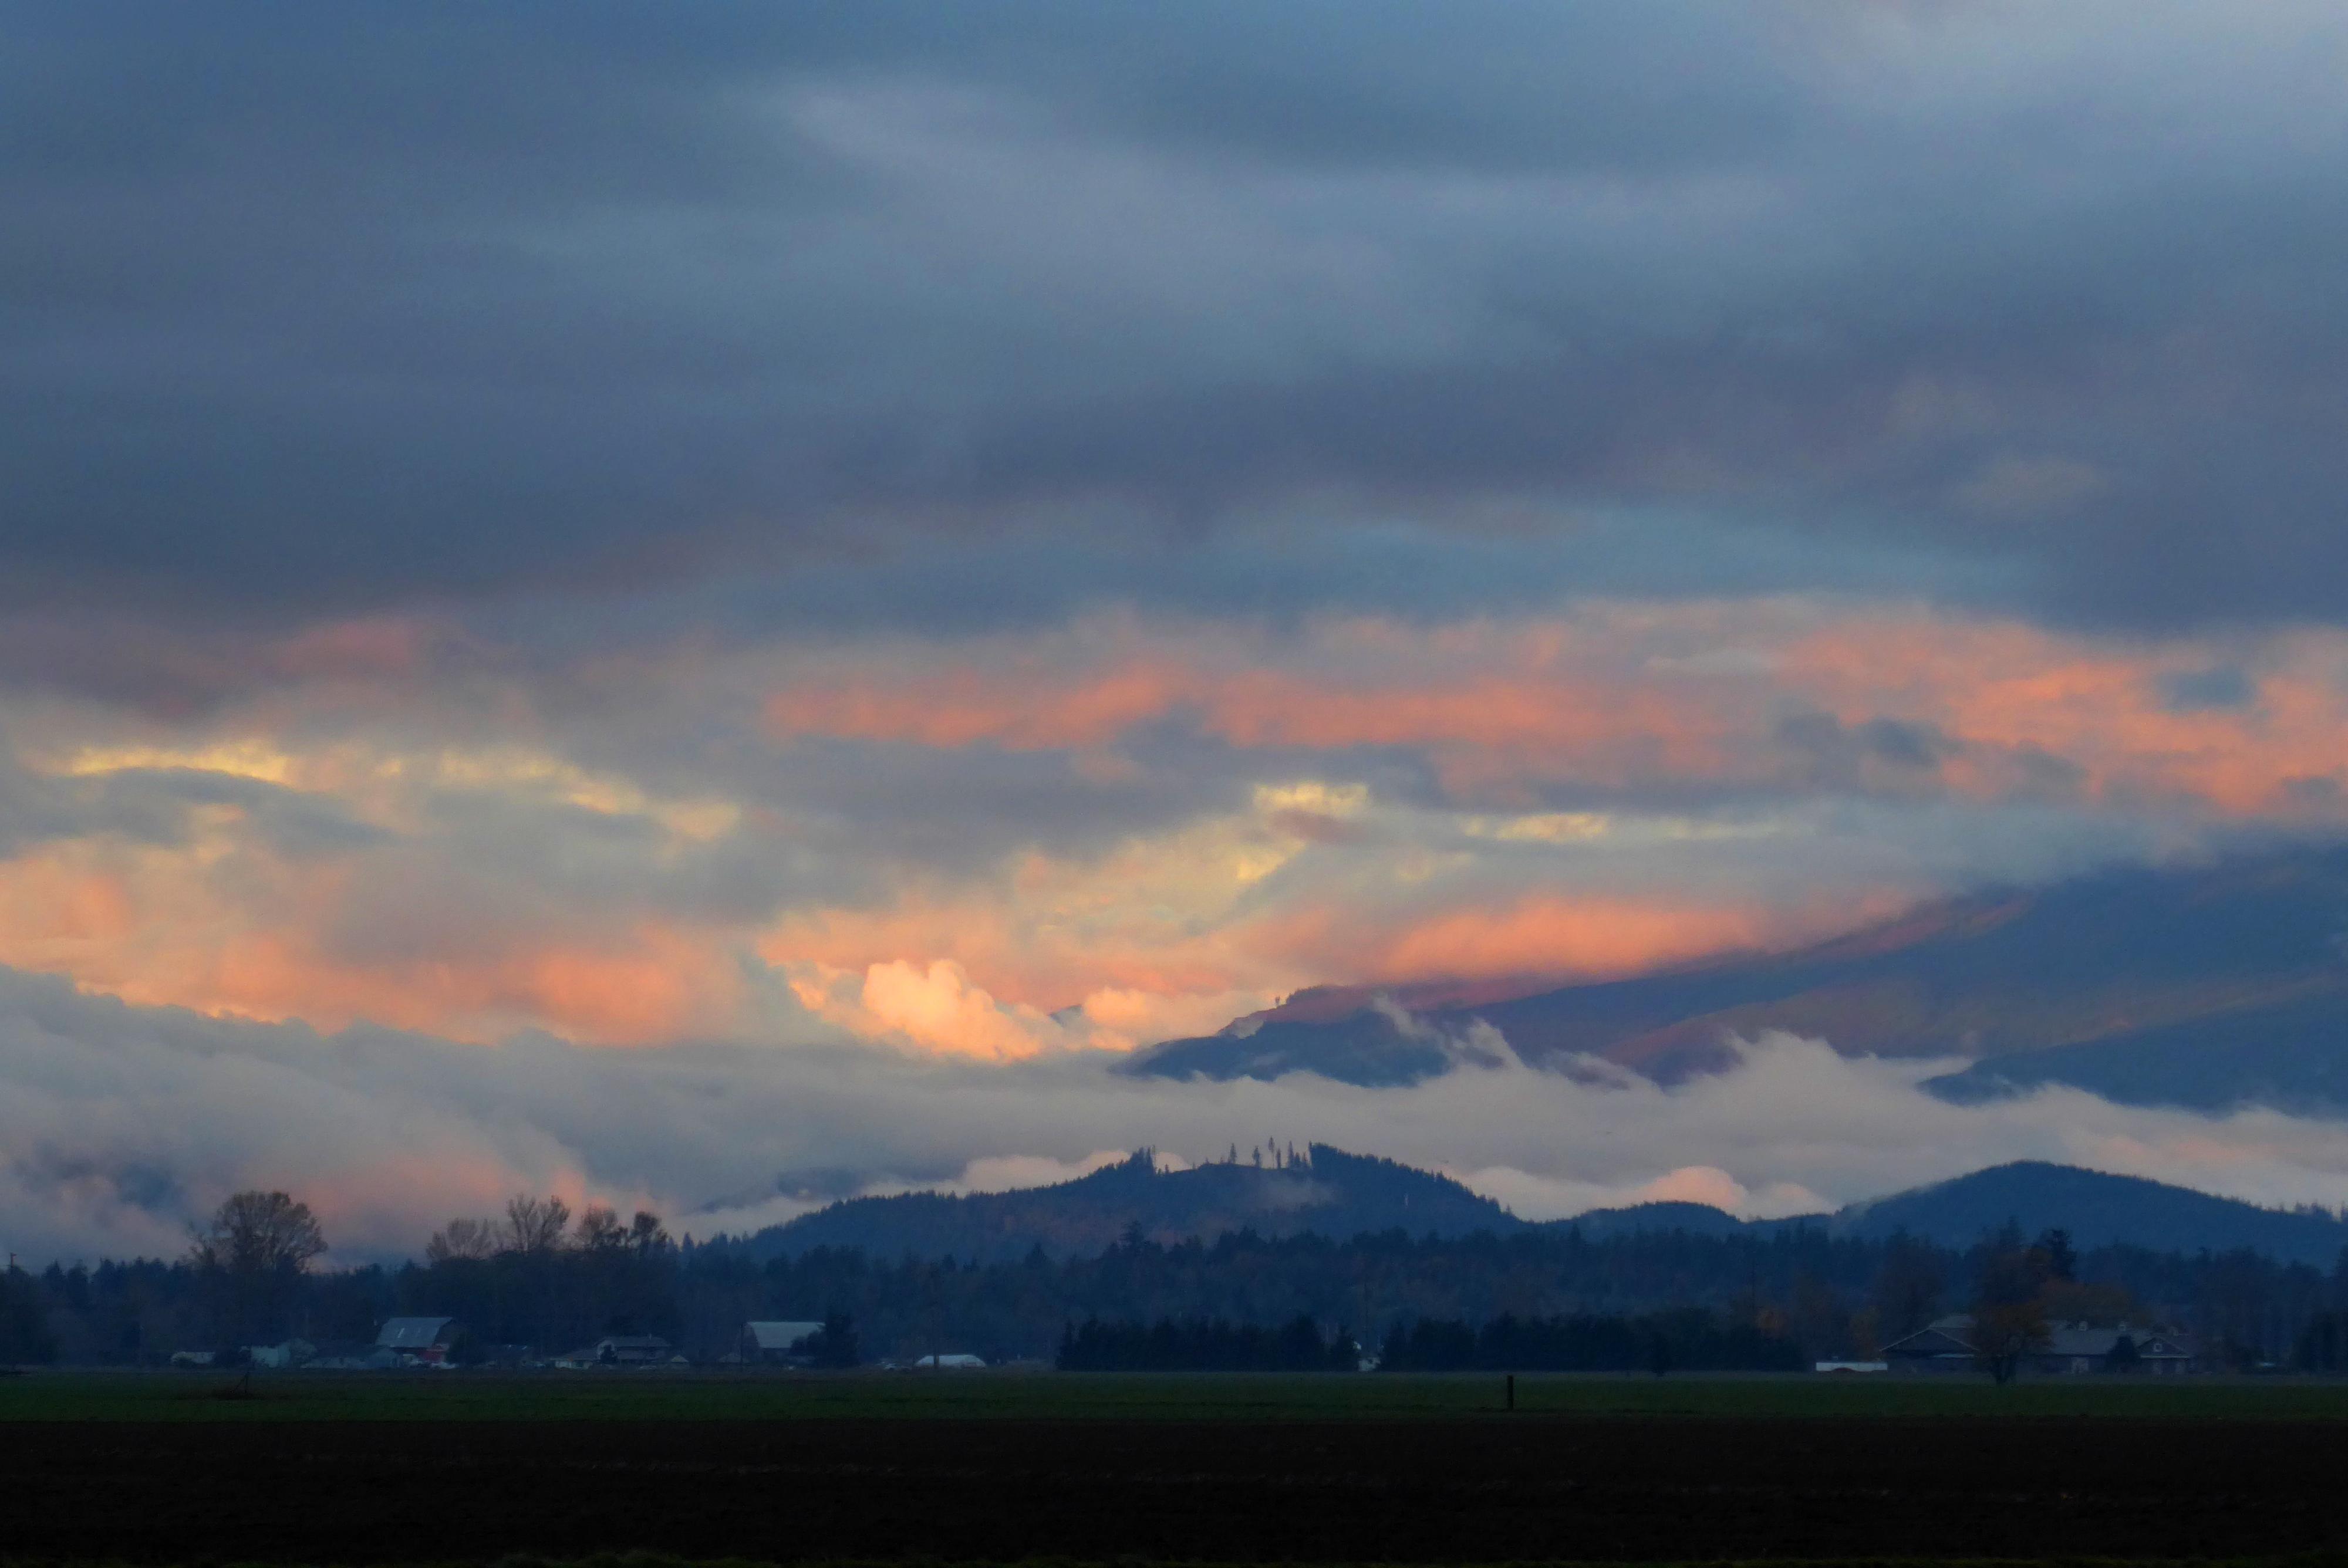 sunset-laconner-4